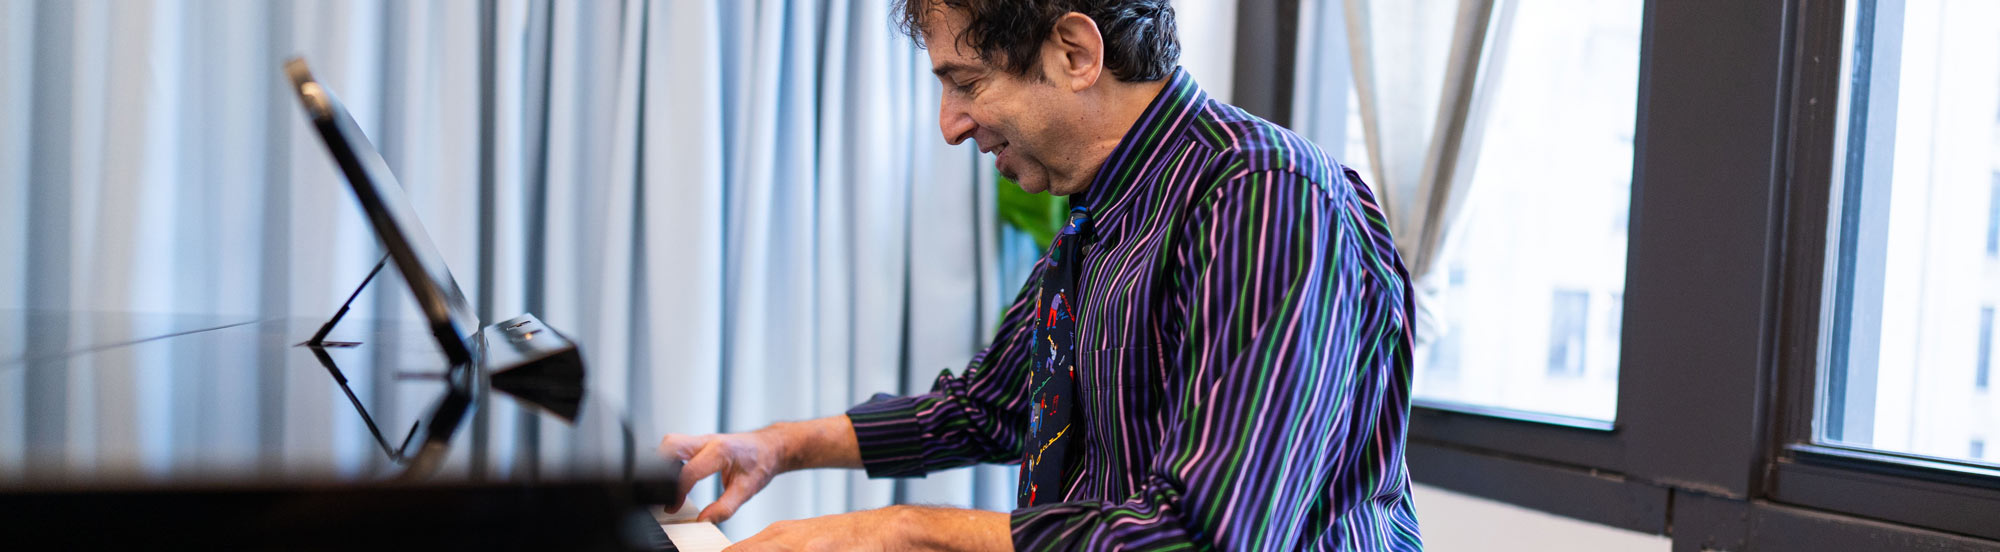 Piano Lessons hero